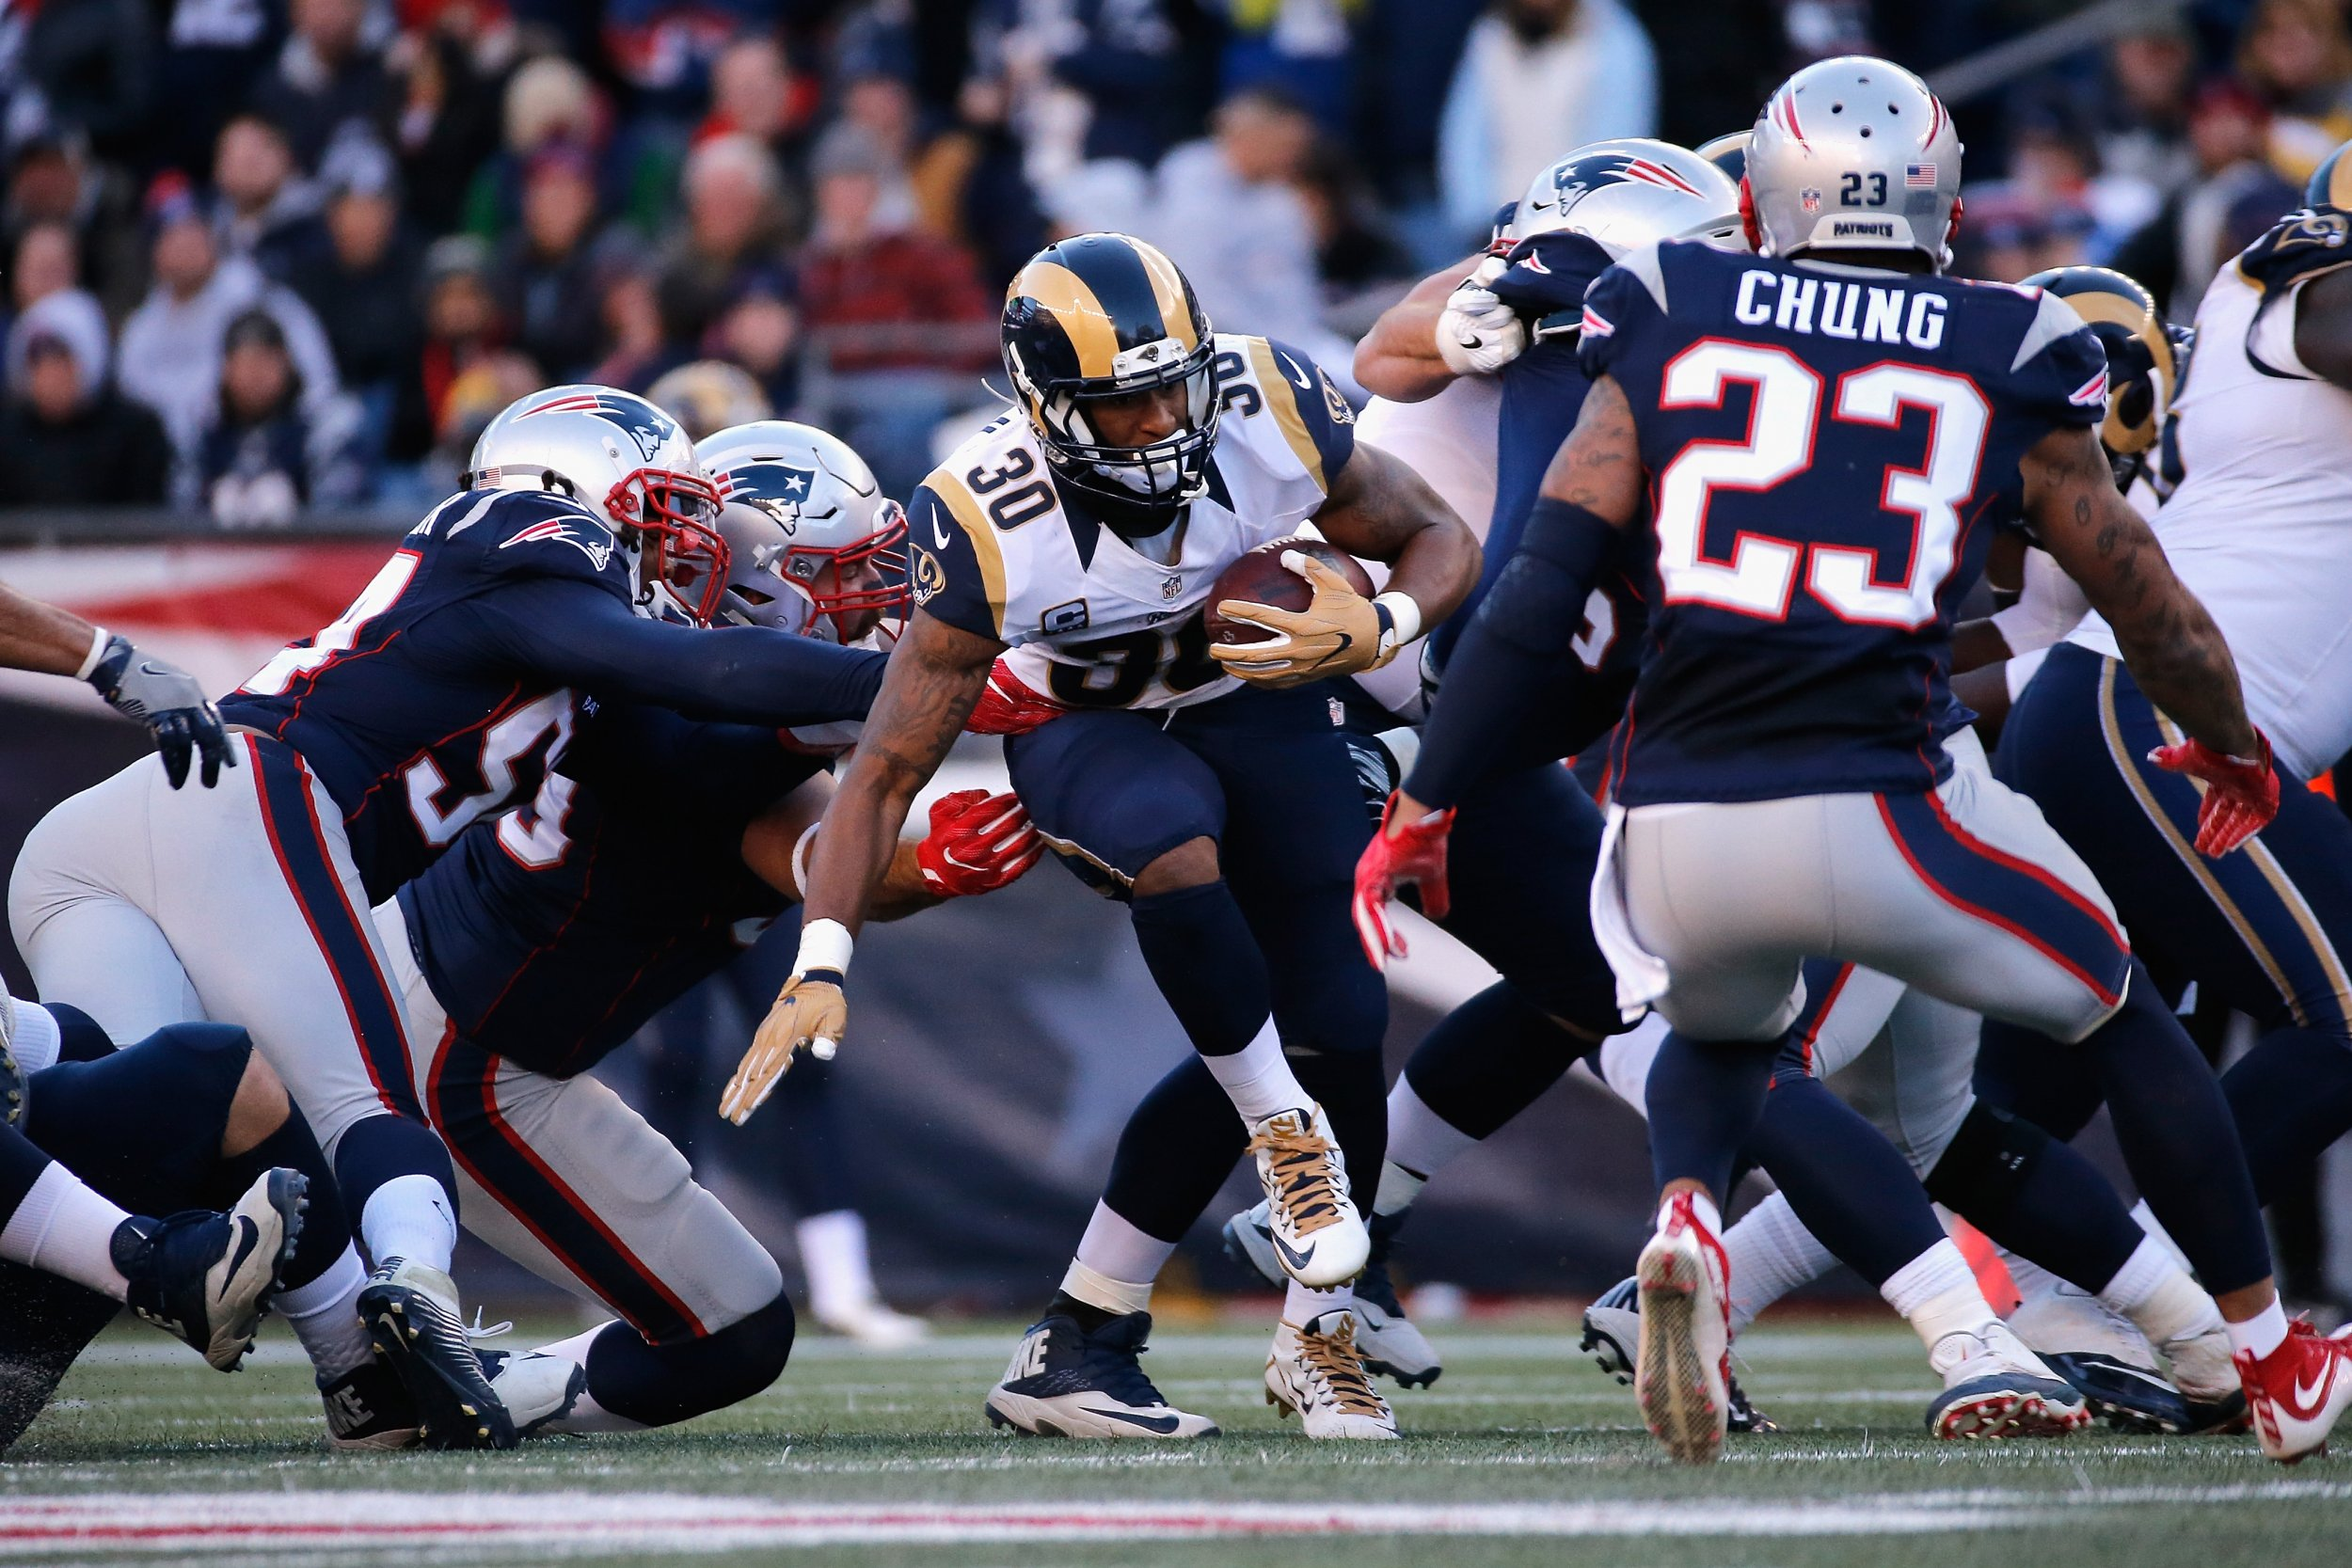 Madden' Super Bowl Predictions: NFL Video Game Has Los